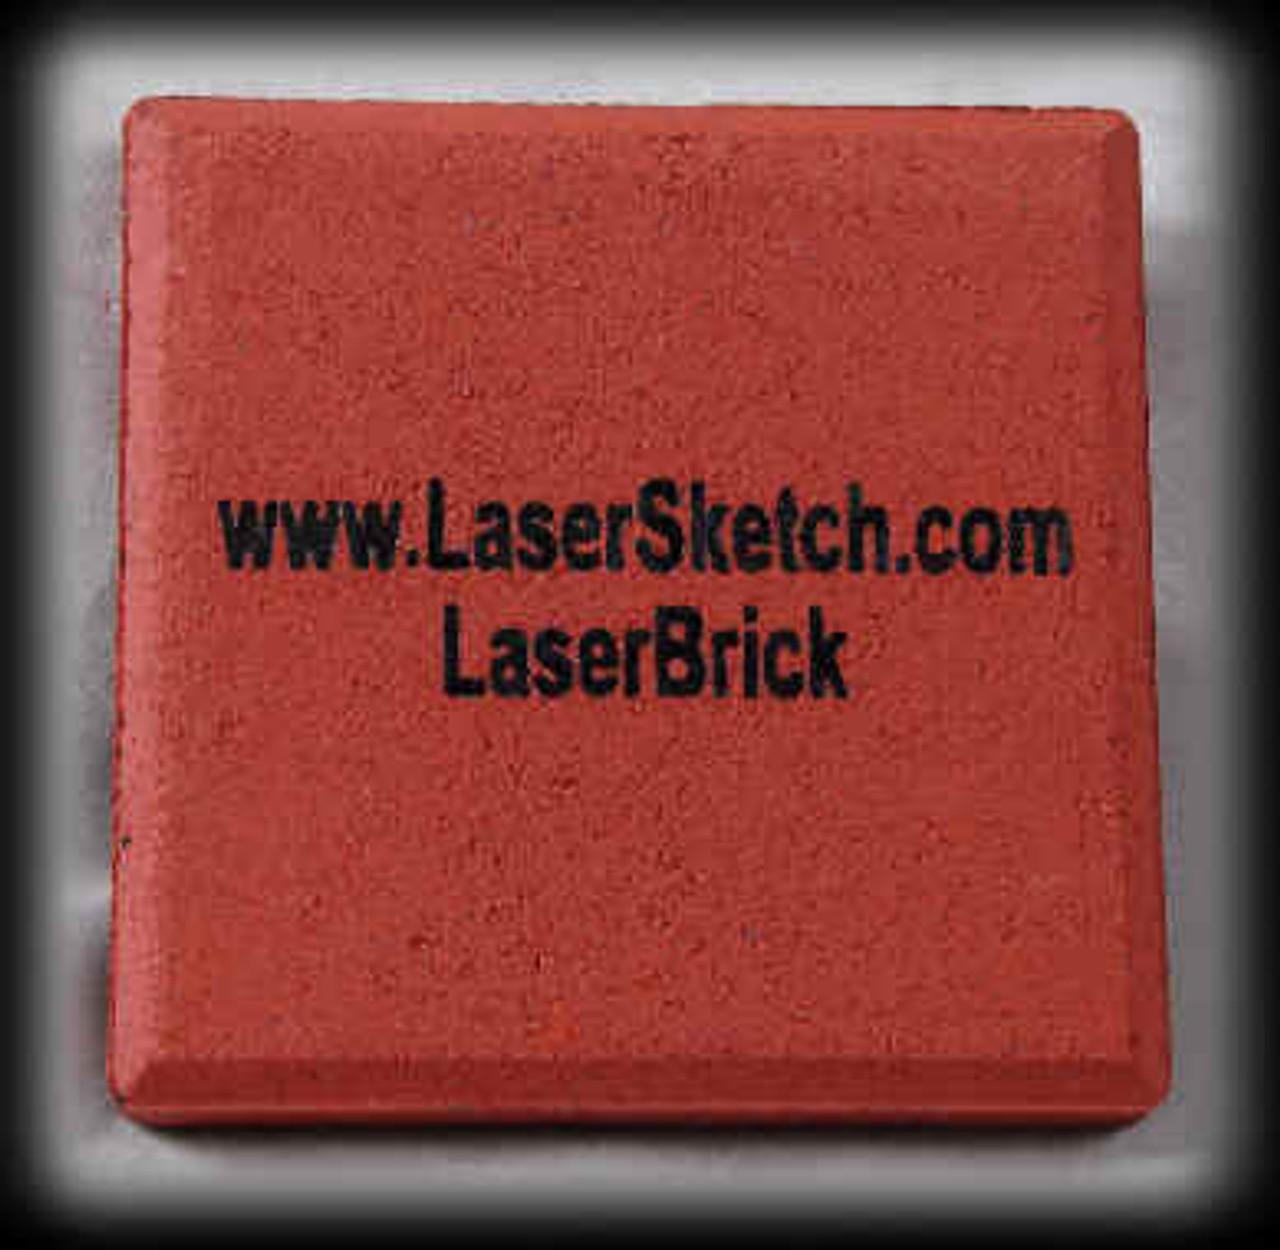 "LaserBrick, 3"" x 3"" x 1/2"" - 50 Count"